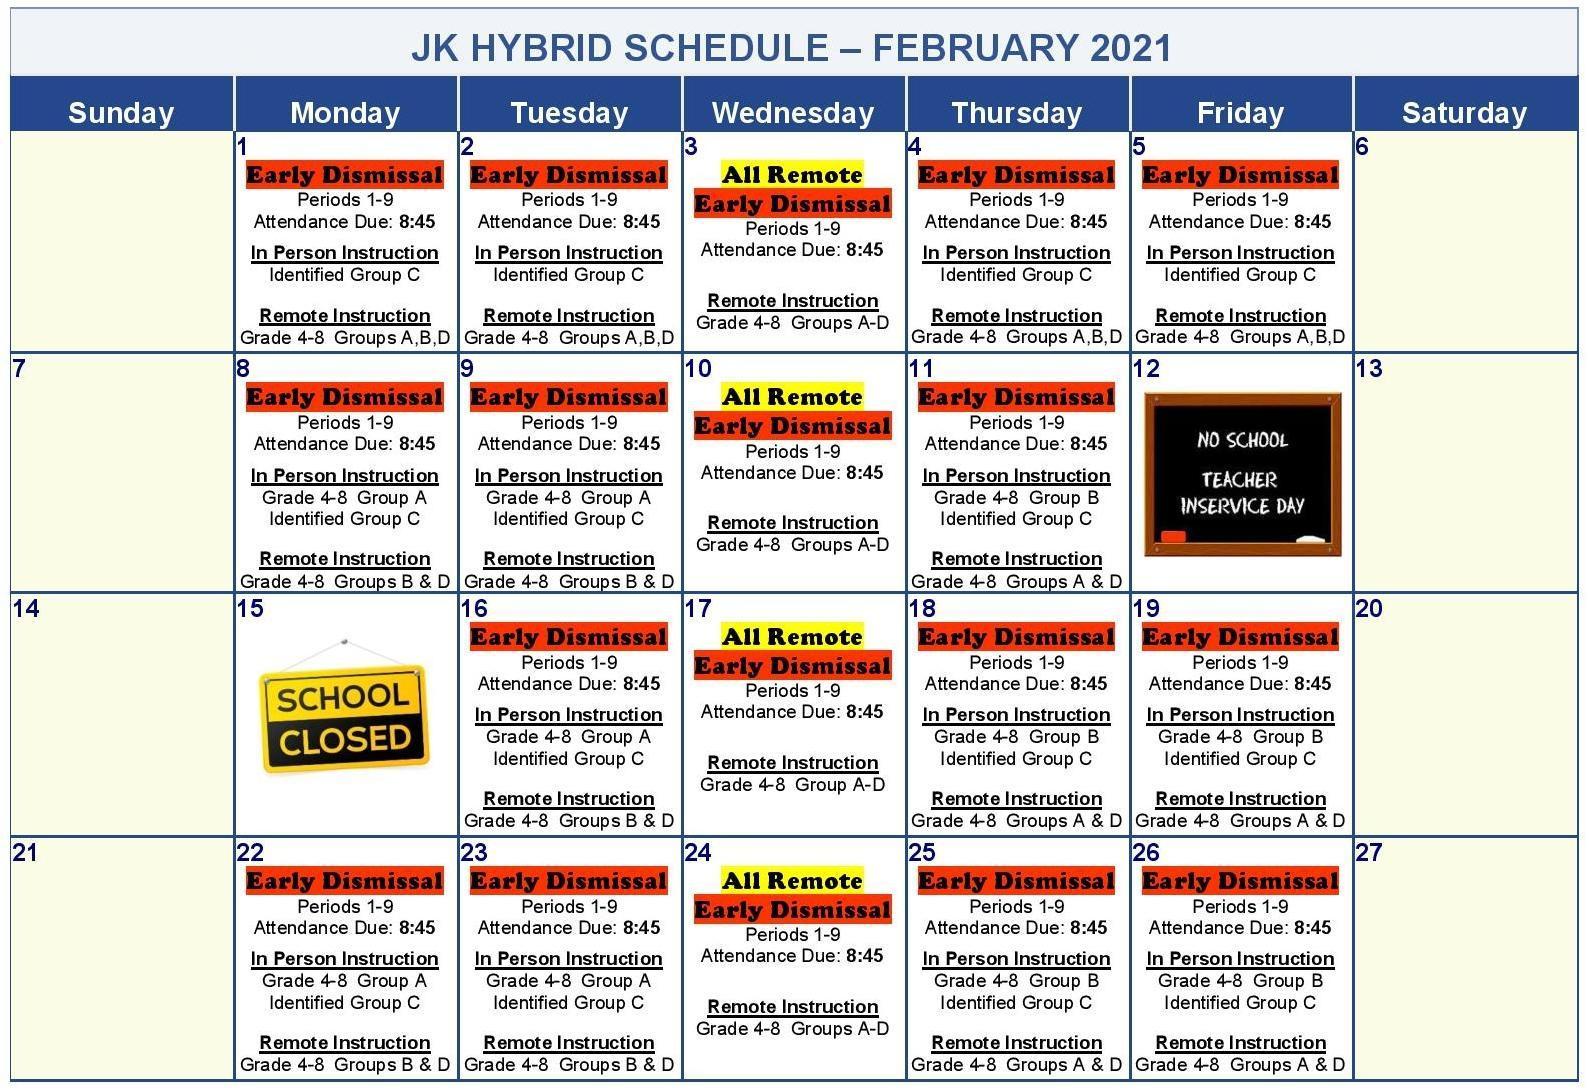 HYBRID LEARNING BEGINS 2/1/21 Image